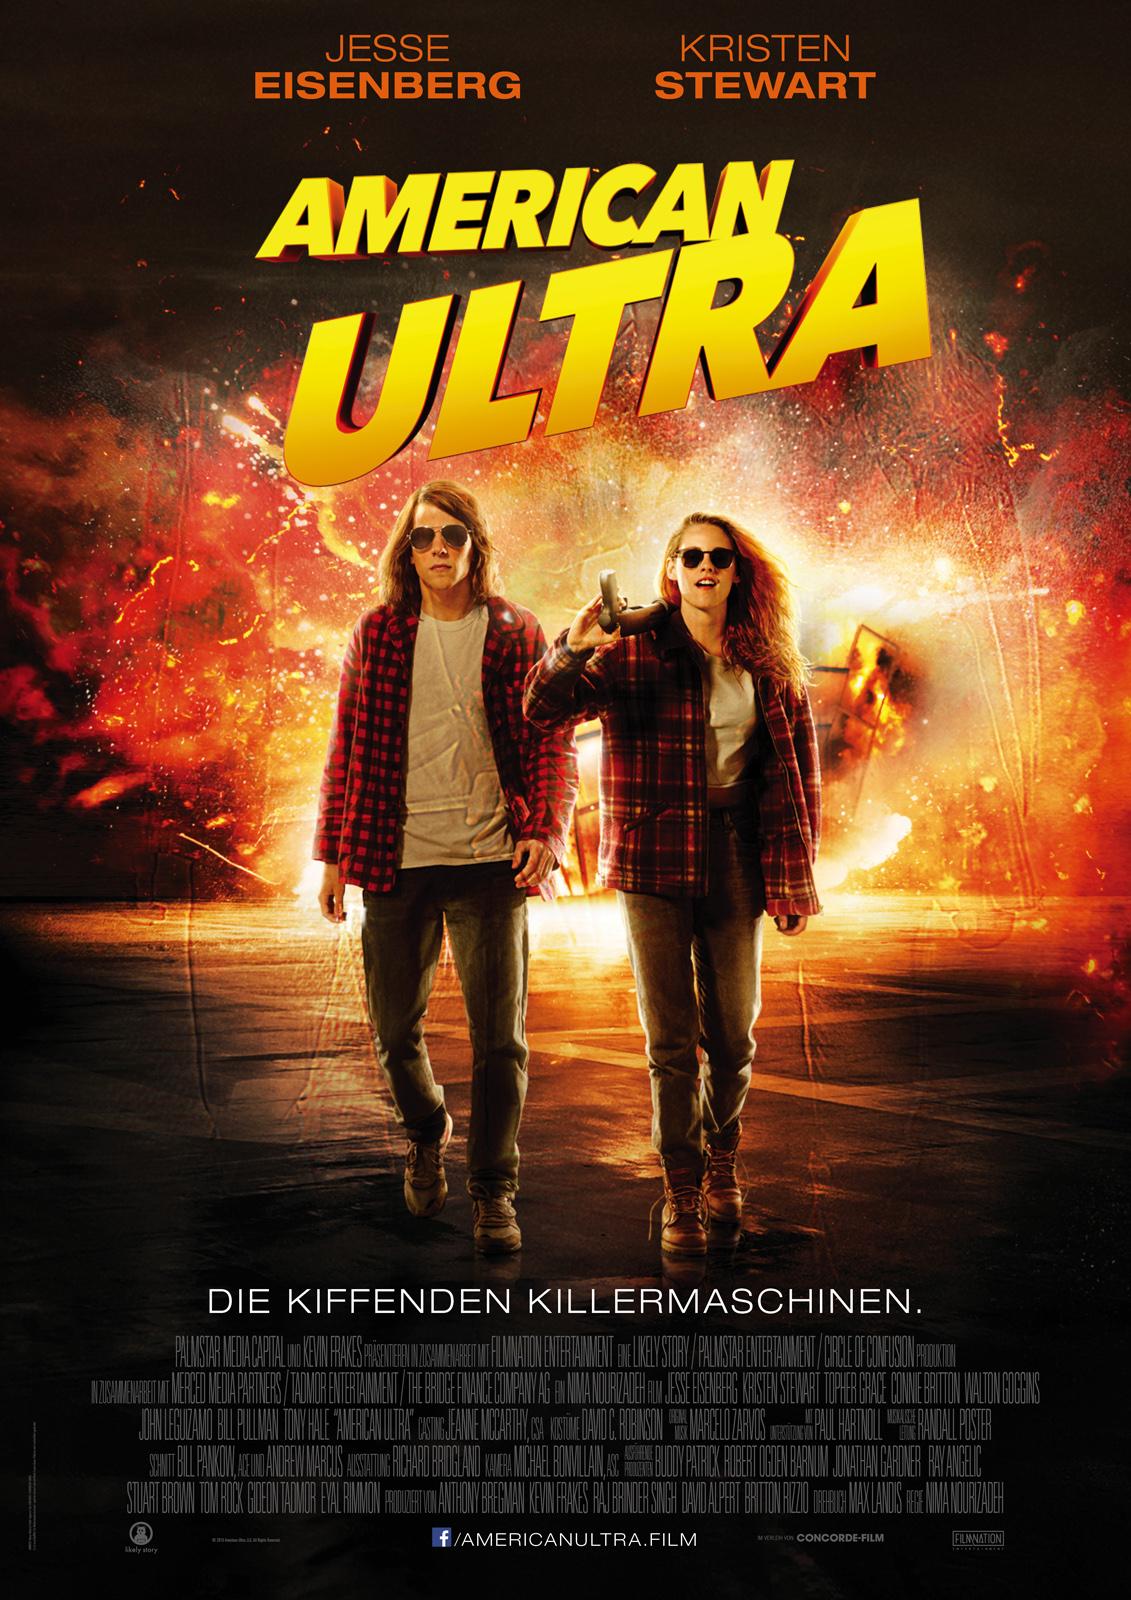 American Ultra | Film-Rezensionen.de